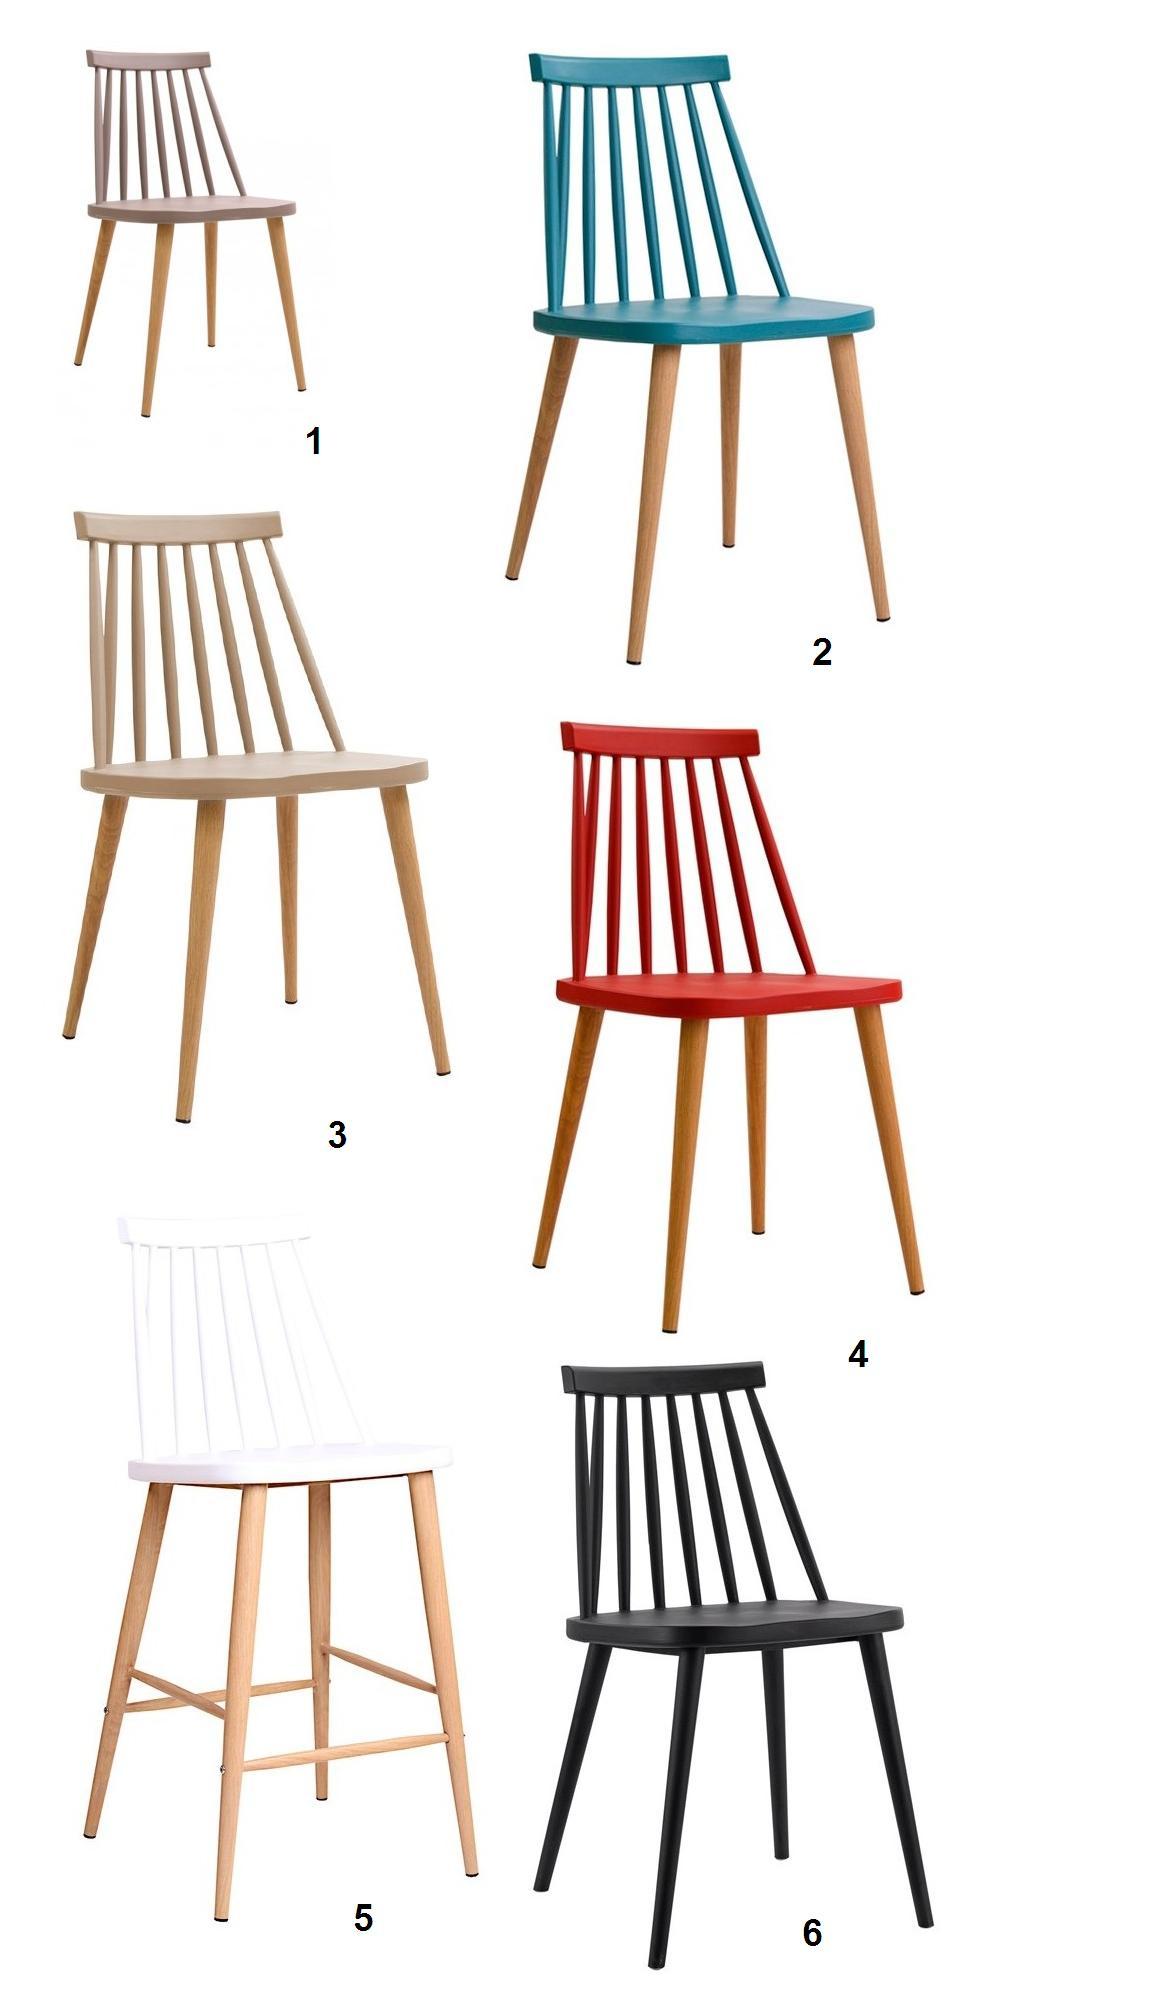 sillas fanett de diseño nórdico